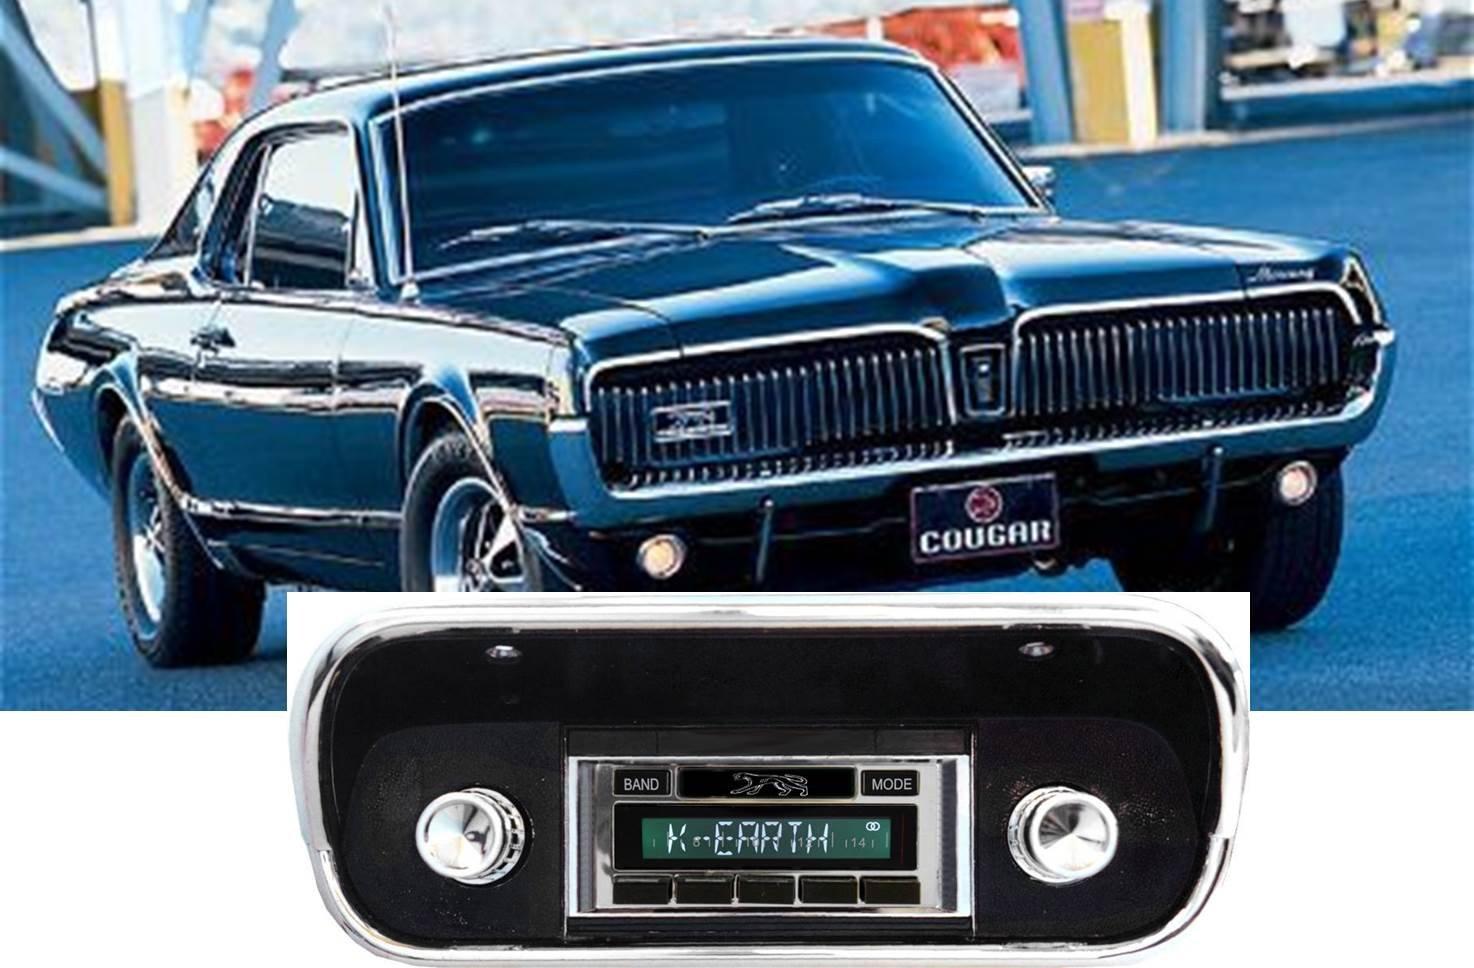 1967-1973 Mercury Cougar USA-630 II High Power 300 watt AM FM Car Stereo/Radio with iPod Docking Cable by Custom Autosound B019ZV749O